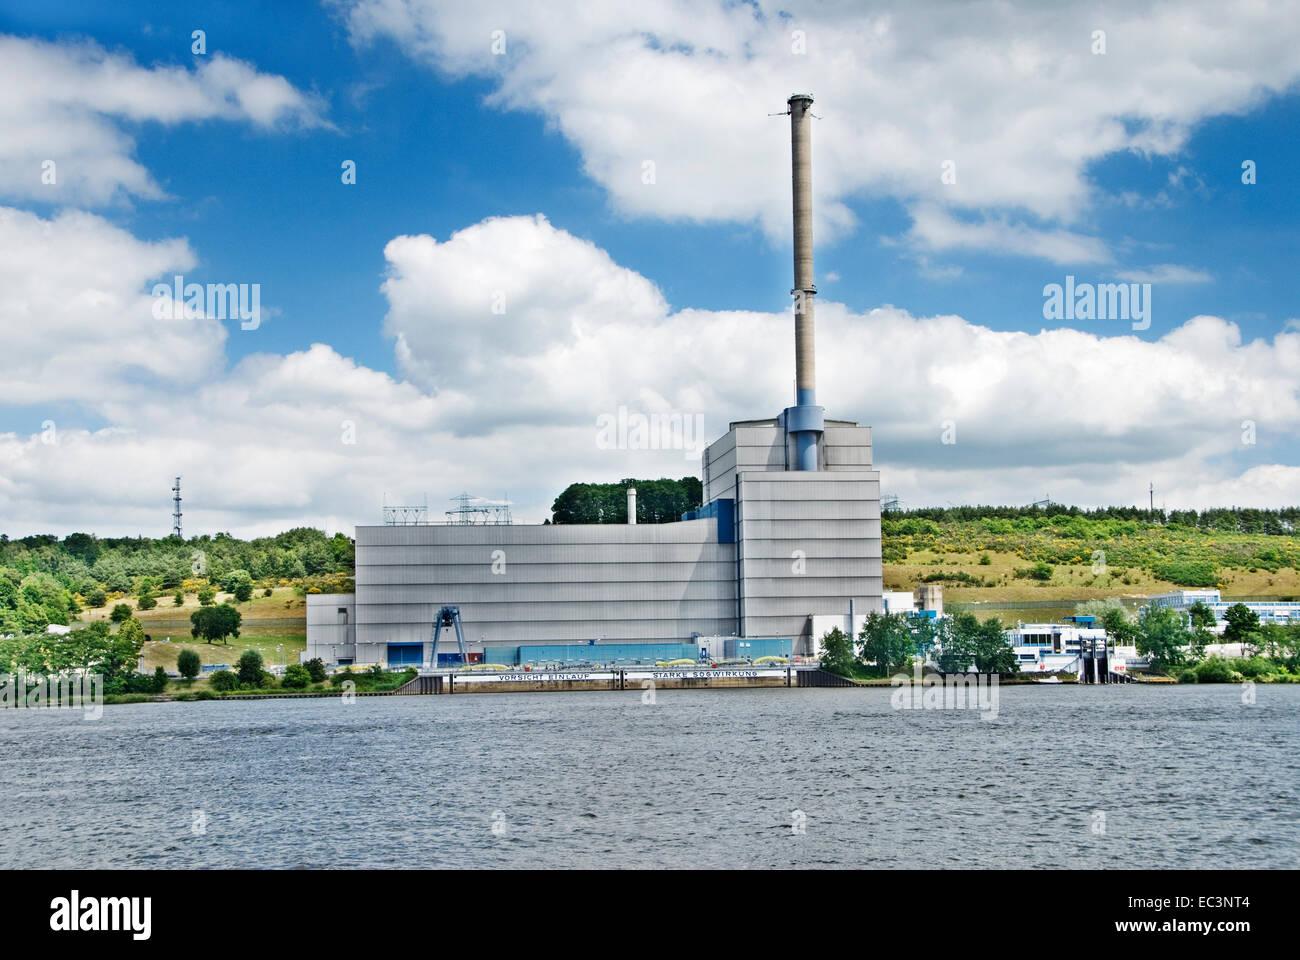 Atomic power plant Kruemmel in Geesthacht, Germany - Stock Image